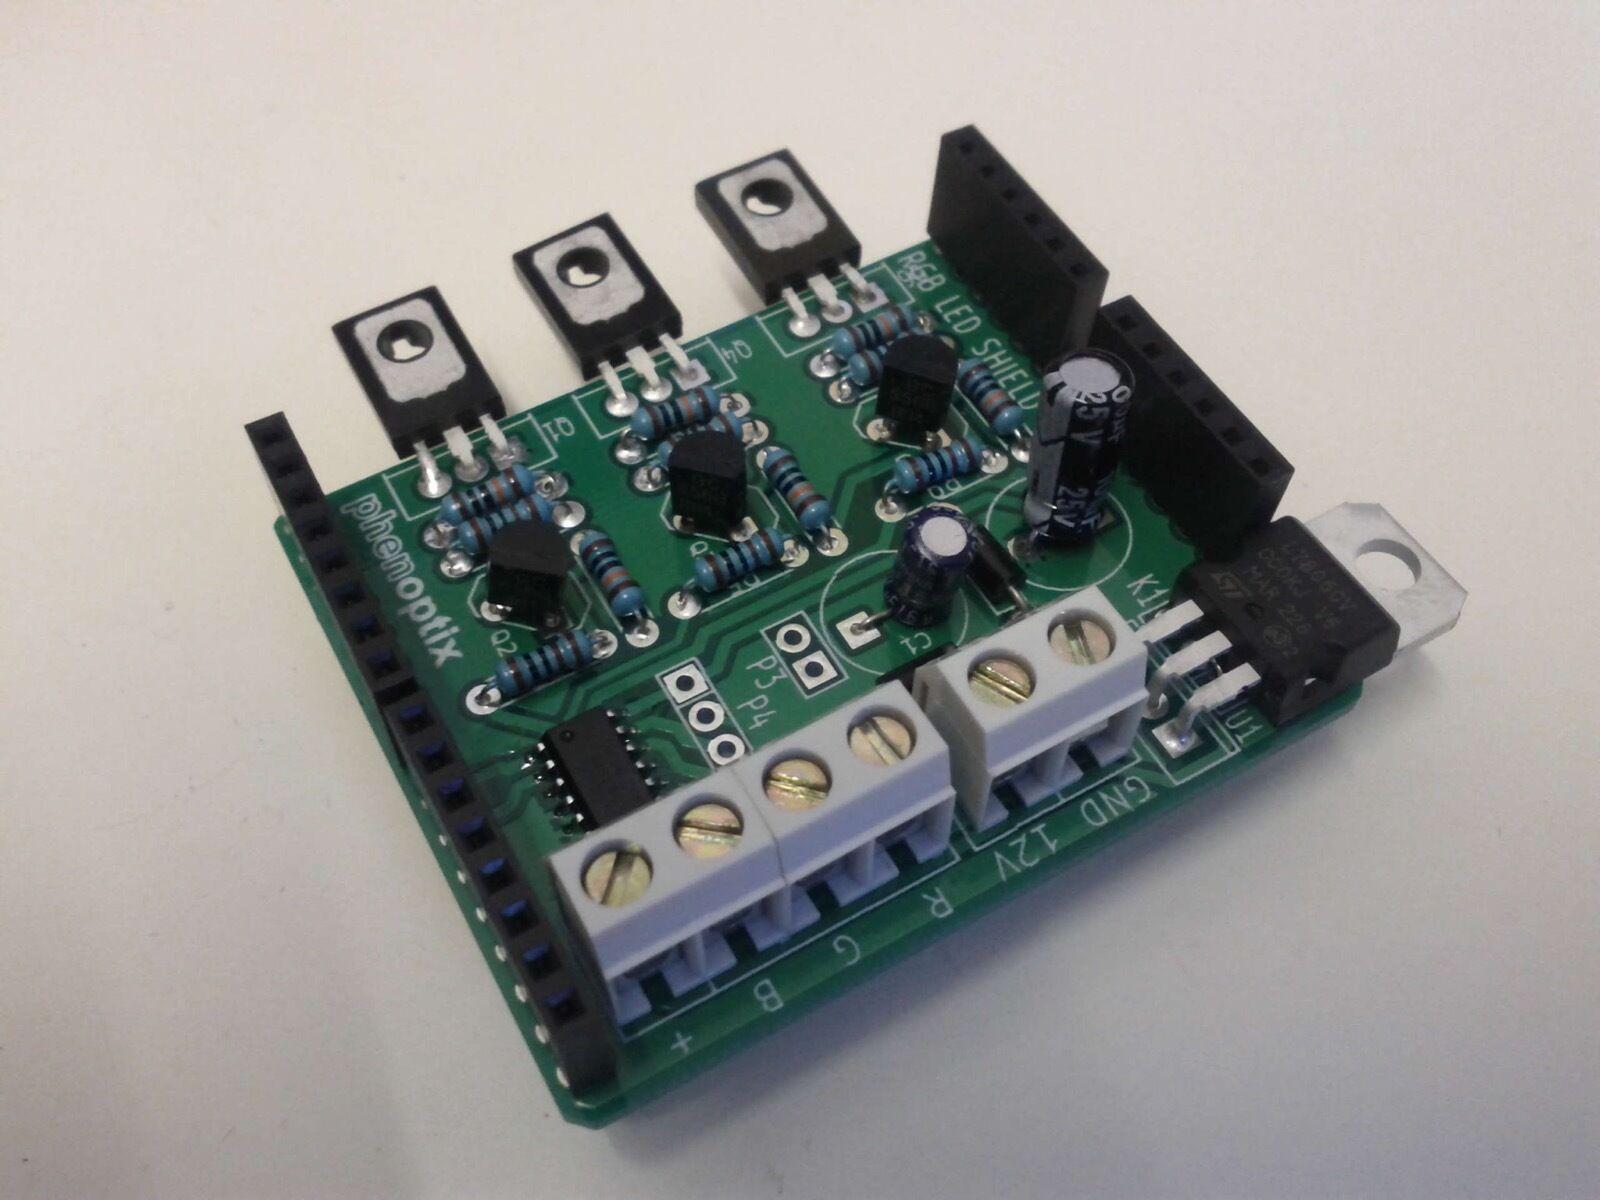 Rgb Led Arduino Uno Shield Kit Ic Ws2801 Ebay 4x4x4 Cube Schematic Light Strip Lighting Wiring Diagram Wq